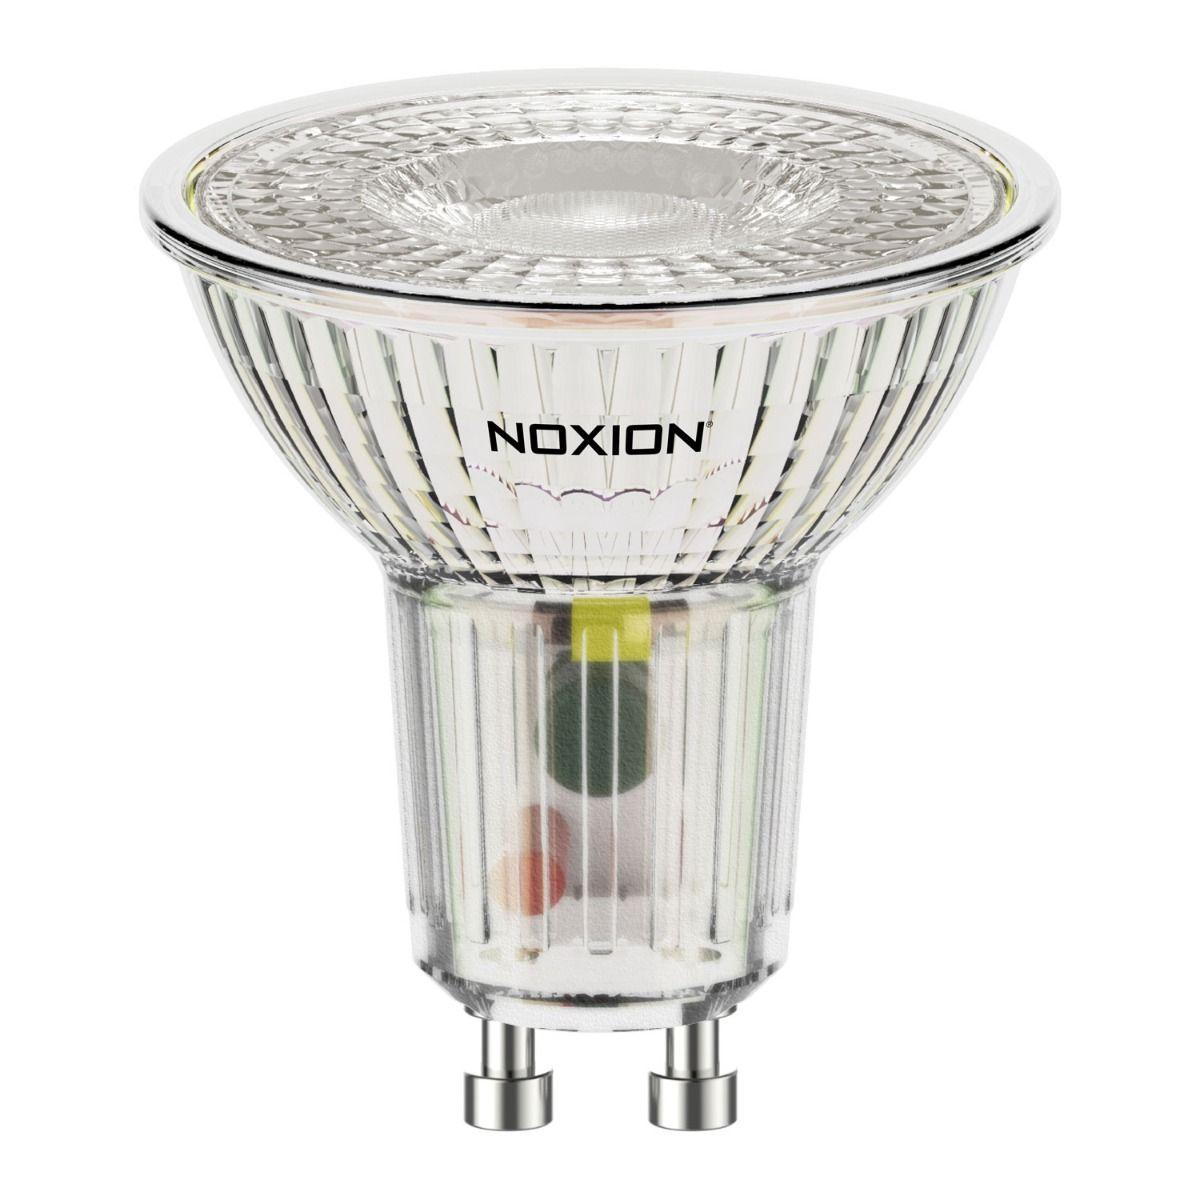 Noxion LED Spot GU10 5W 840 36D 520lm | Vervanger voor 60W